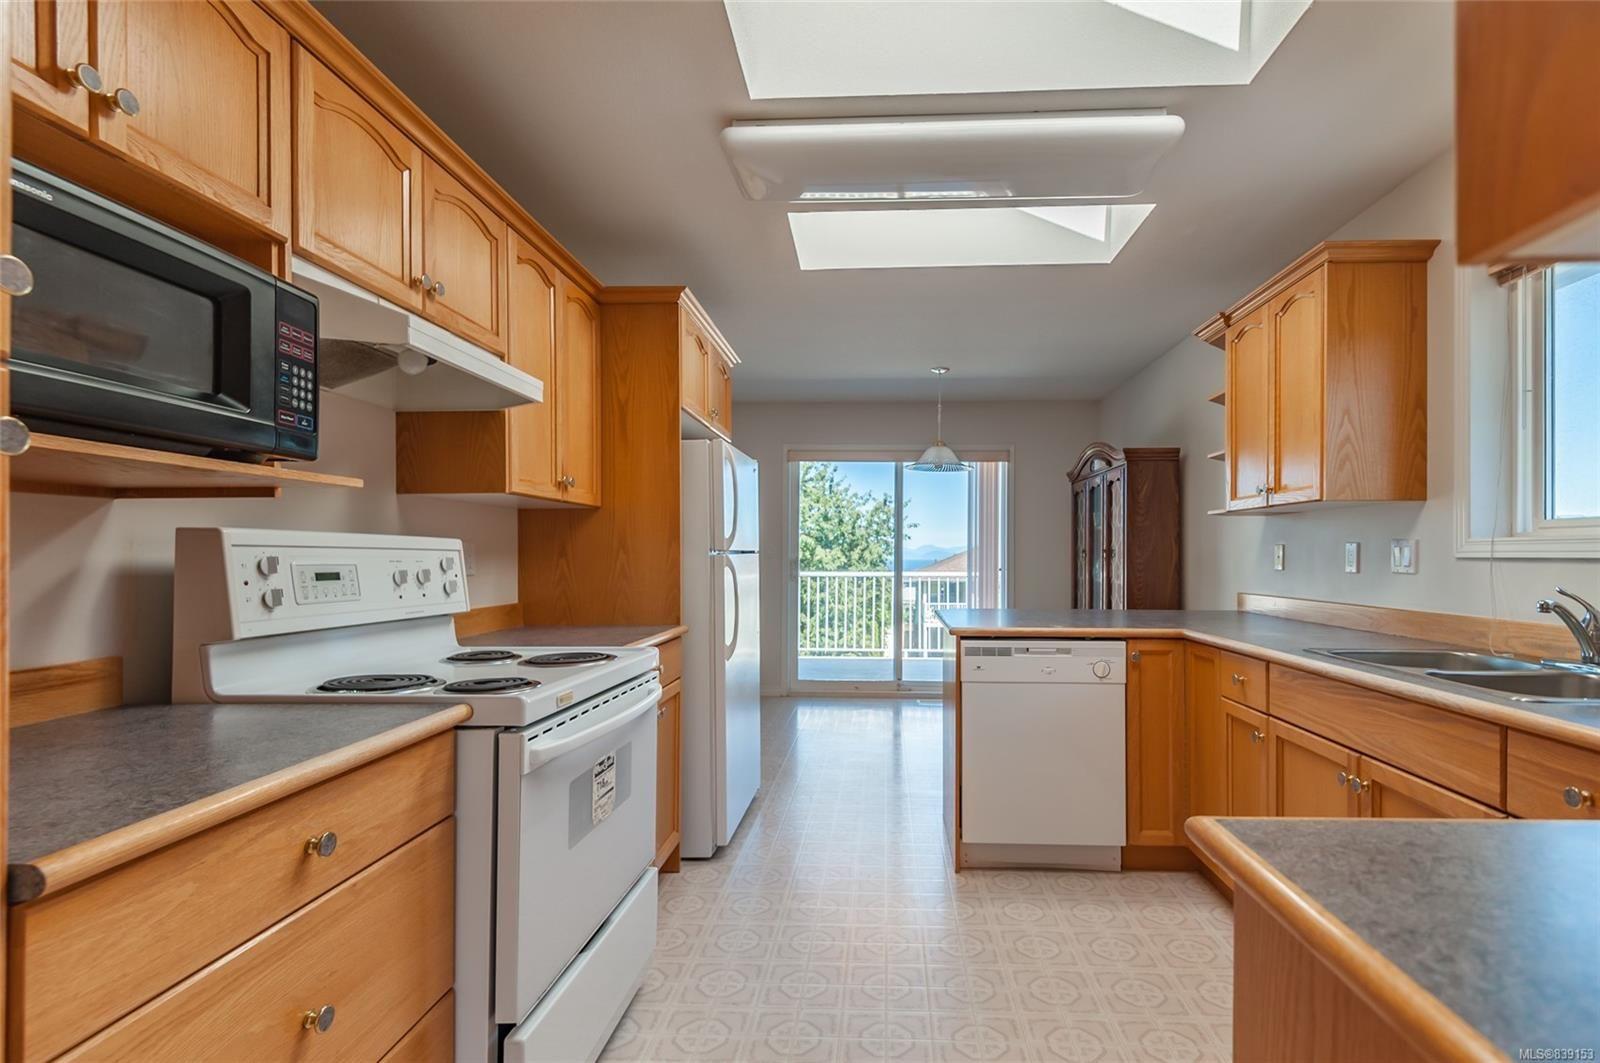 Photo 7: Photos: 6412 Dover Rd in NANAIMO: Na North Nanaimo House for sale (Nanaimo)  : MLS®# 839153